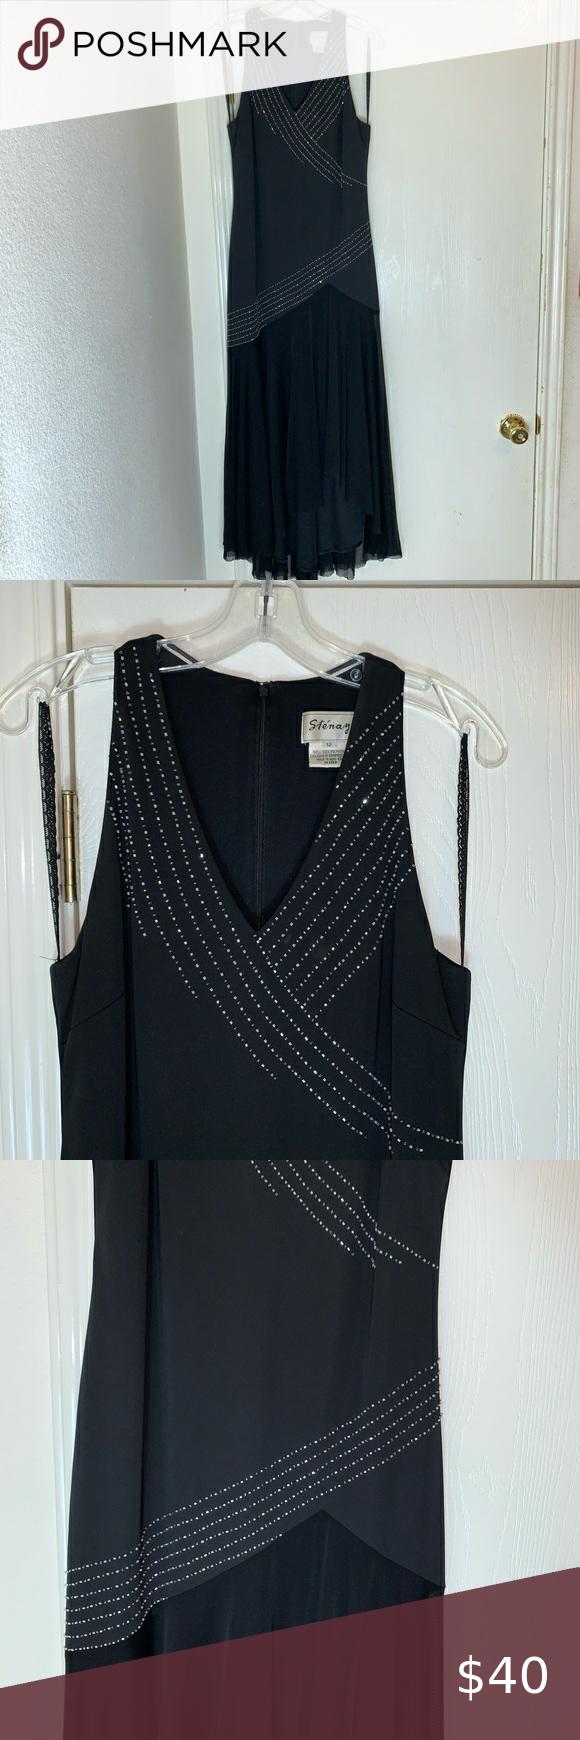 Stenay Black Dress With Crystals Size 12 Dress Size Chart Women Black Beaded Dress Black Maxi Dress [ 1740 x 580 Pixel ]